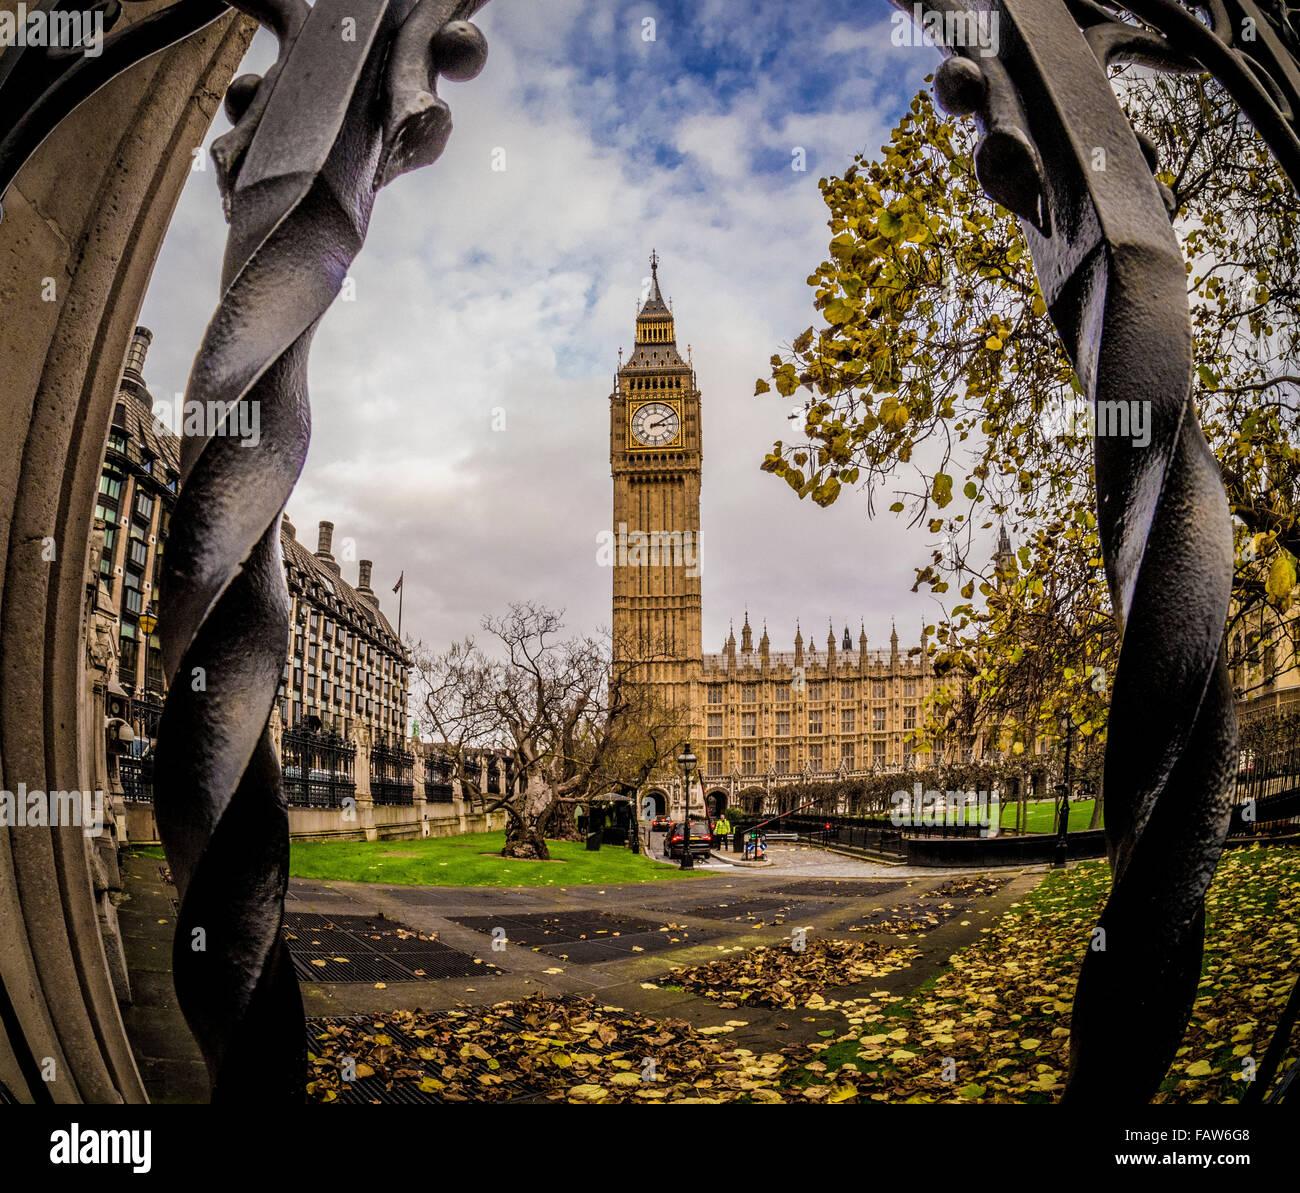 Big Ben und den Houses of Parliament, London, UK. Stockbild